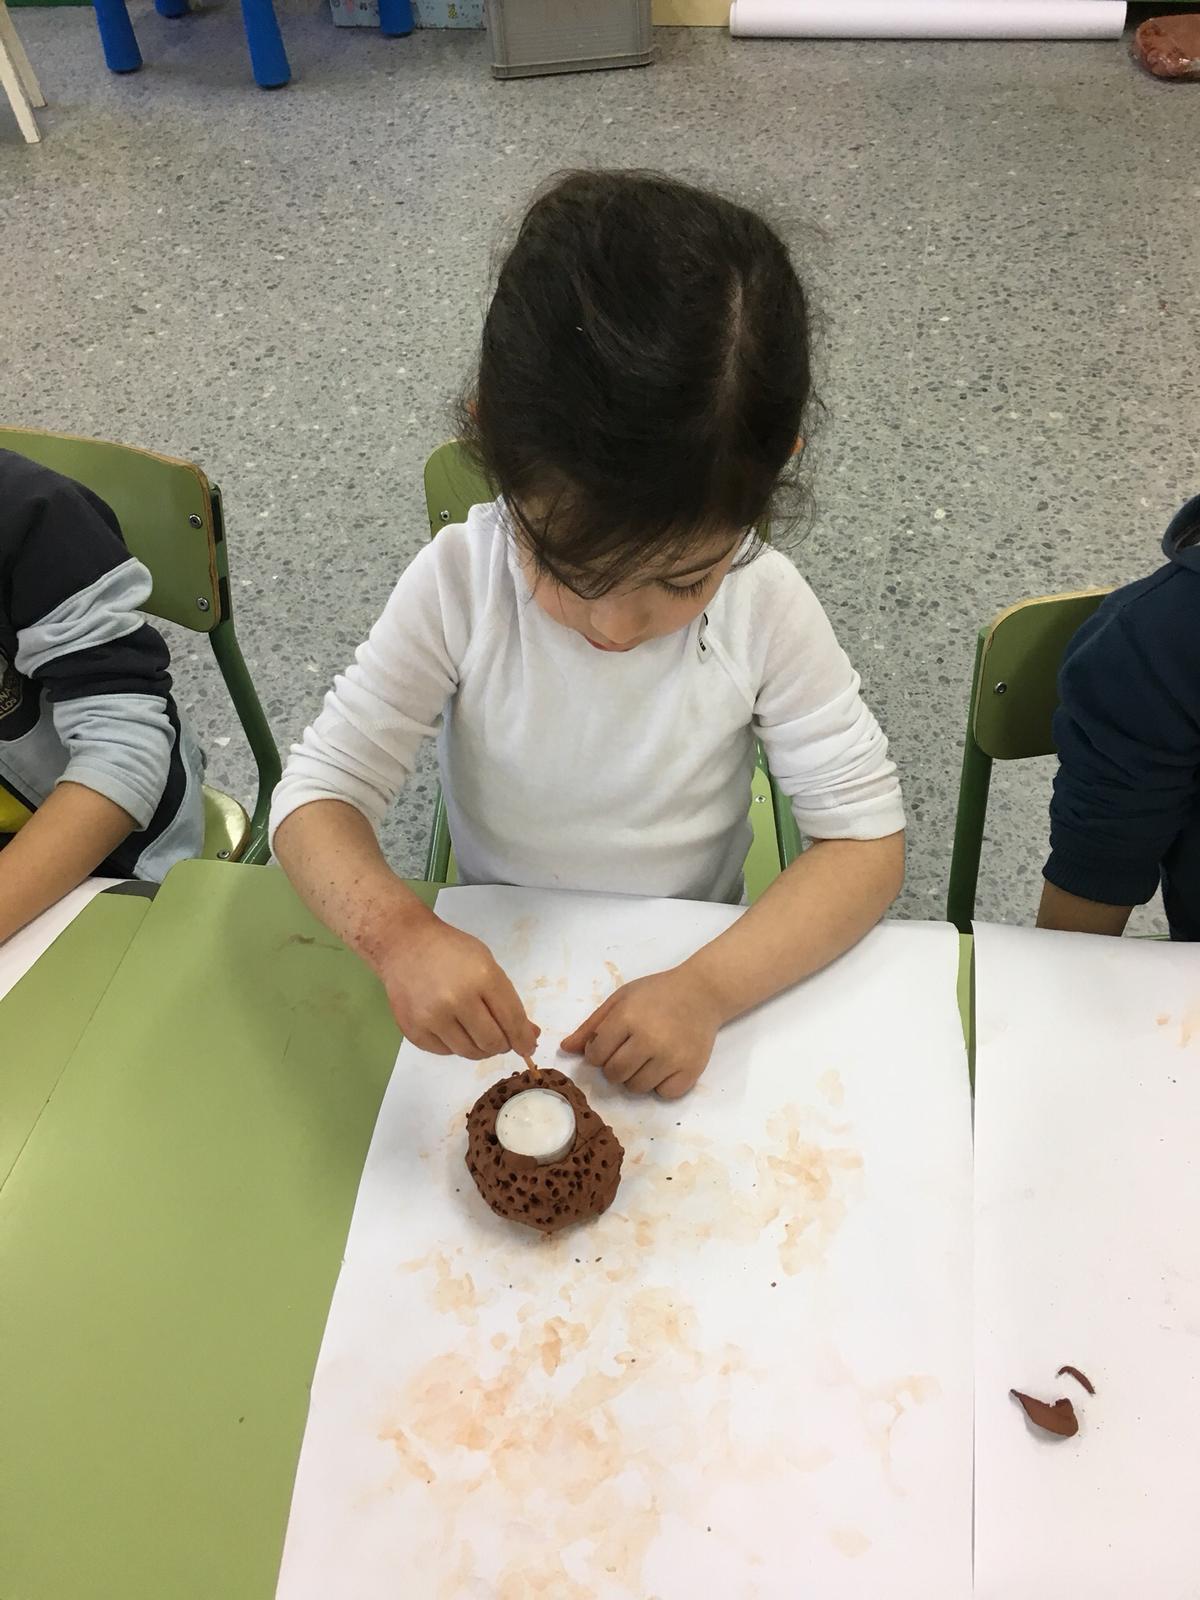 2019_03_15_Infantil 4B descubre la pintura rupestre_CEIP FDLR_Las Rozas 6